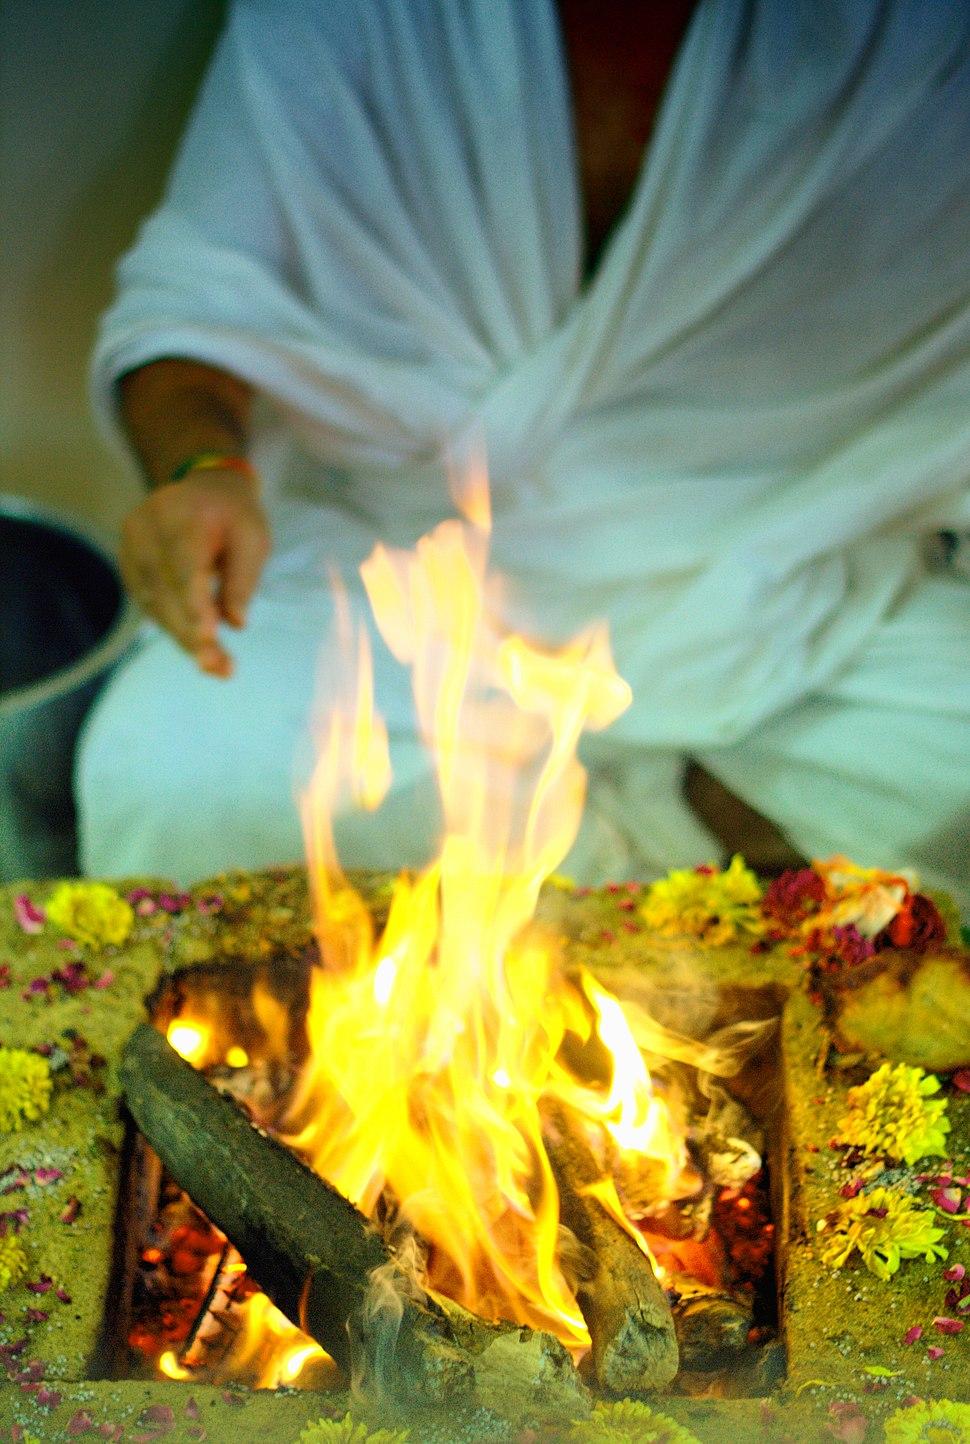 (A) Hindu puja, yajna, yagna, Havanam in progress